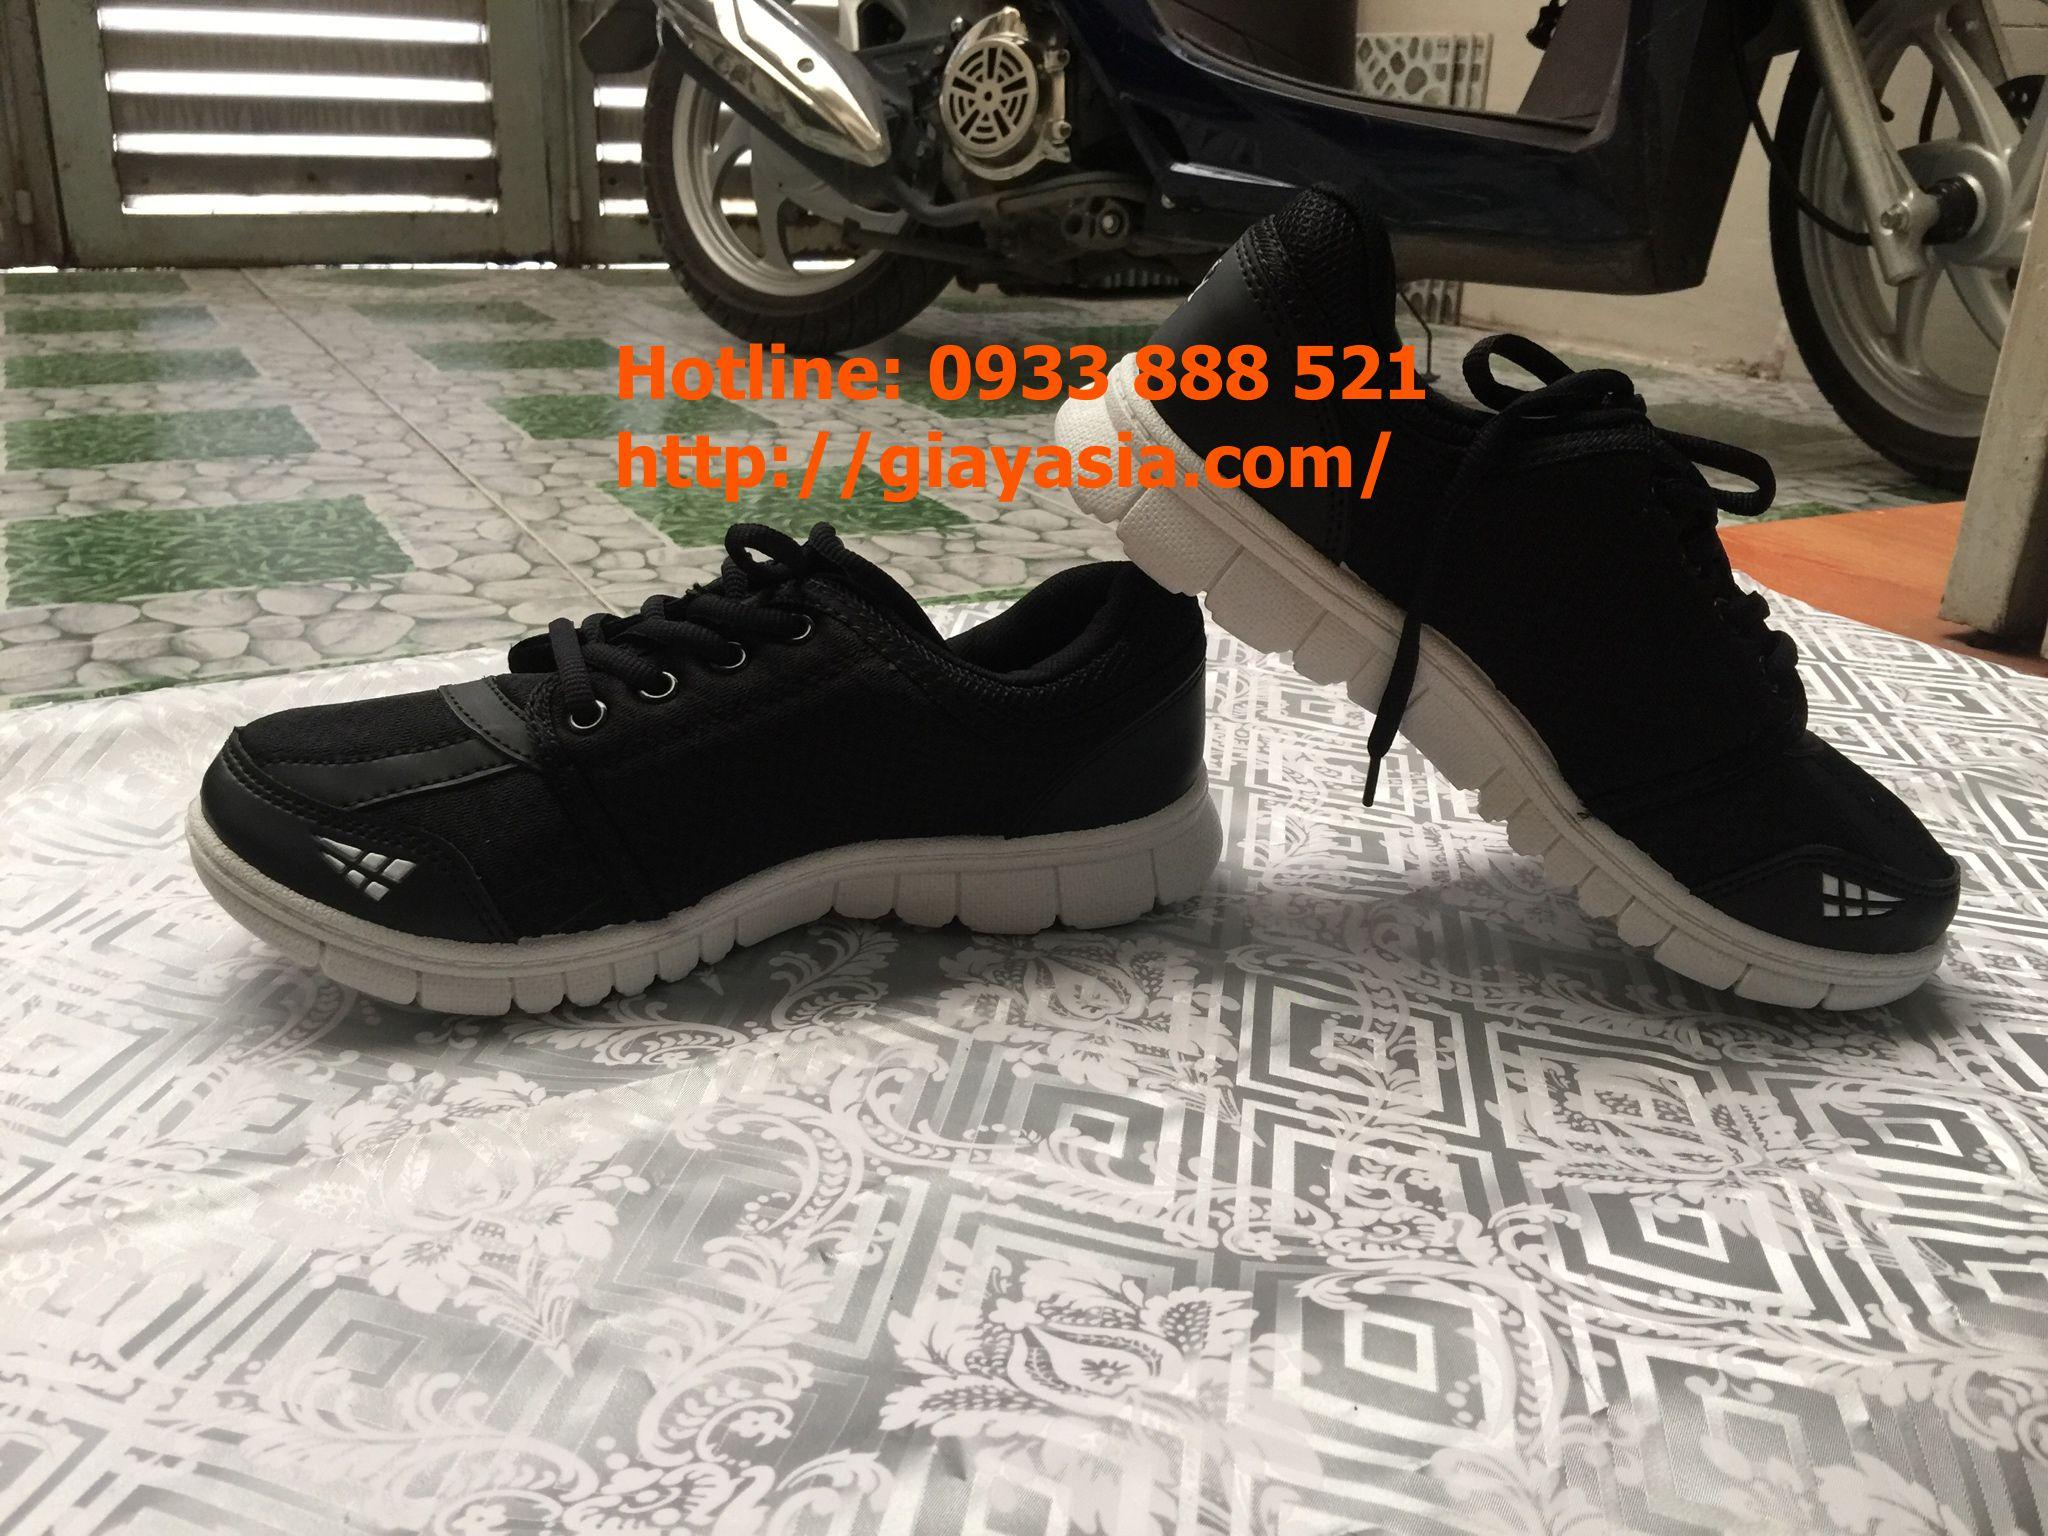 Giày asia thời trang nam đen